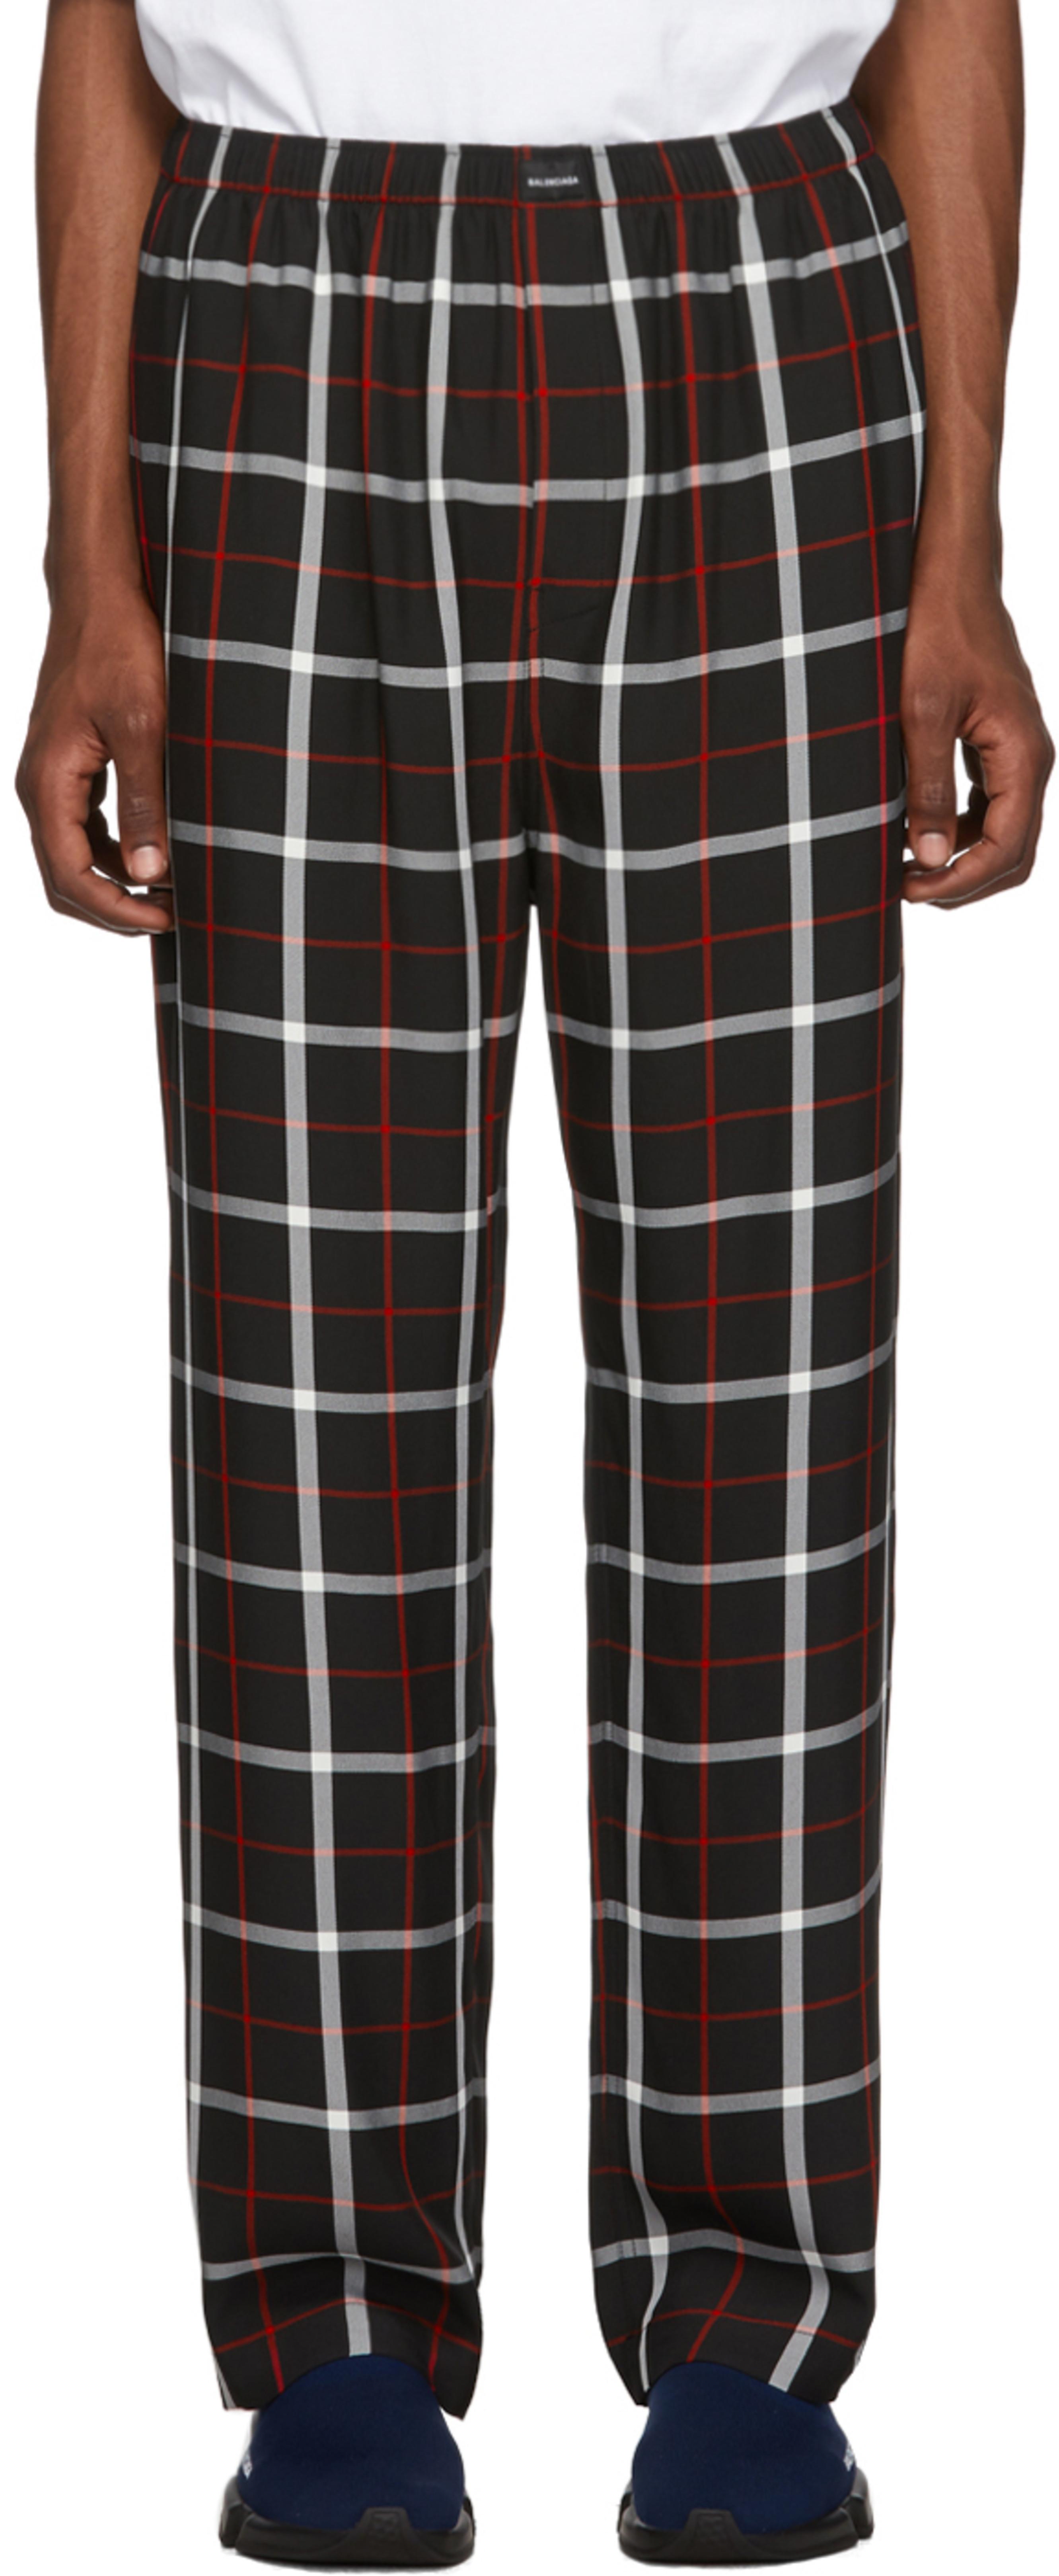 34093909959 Black & White Check Fluid Pyjama Trousers